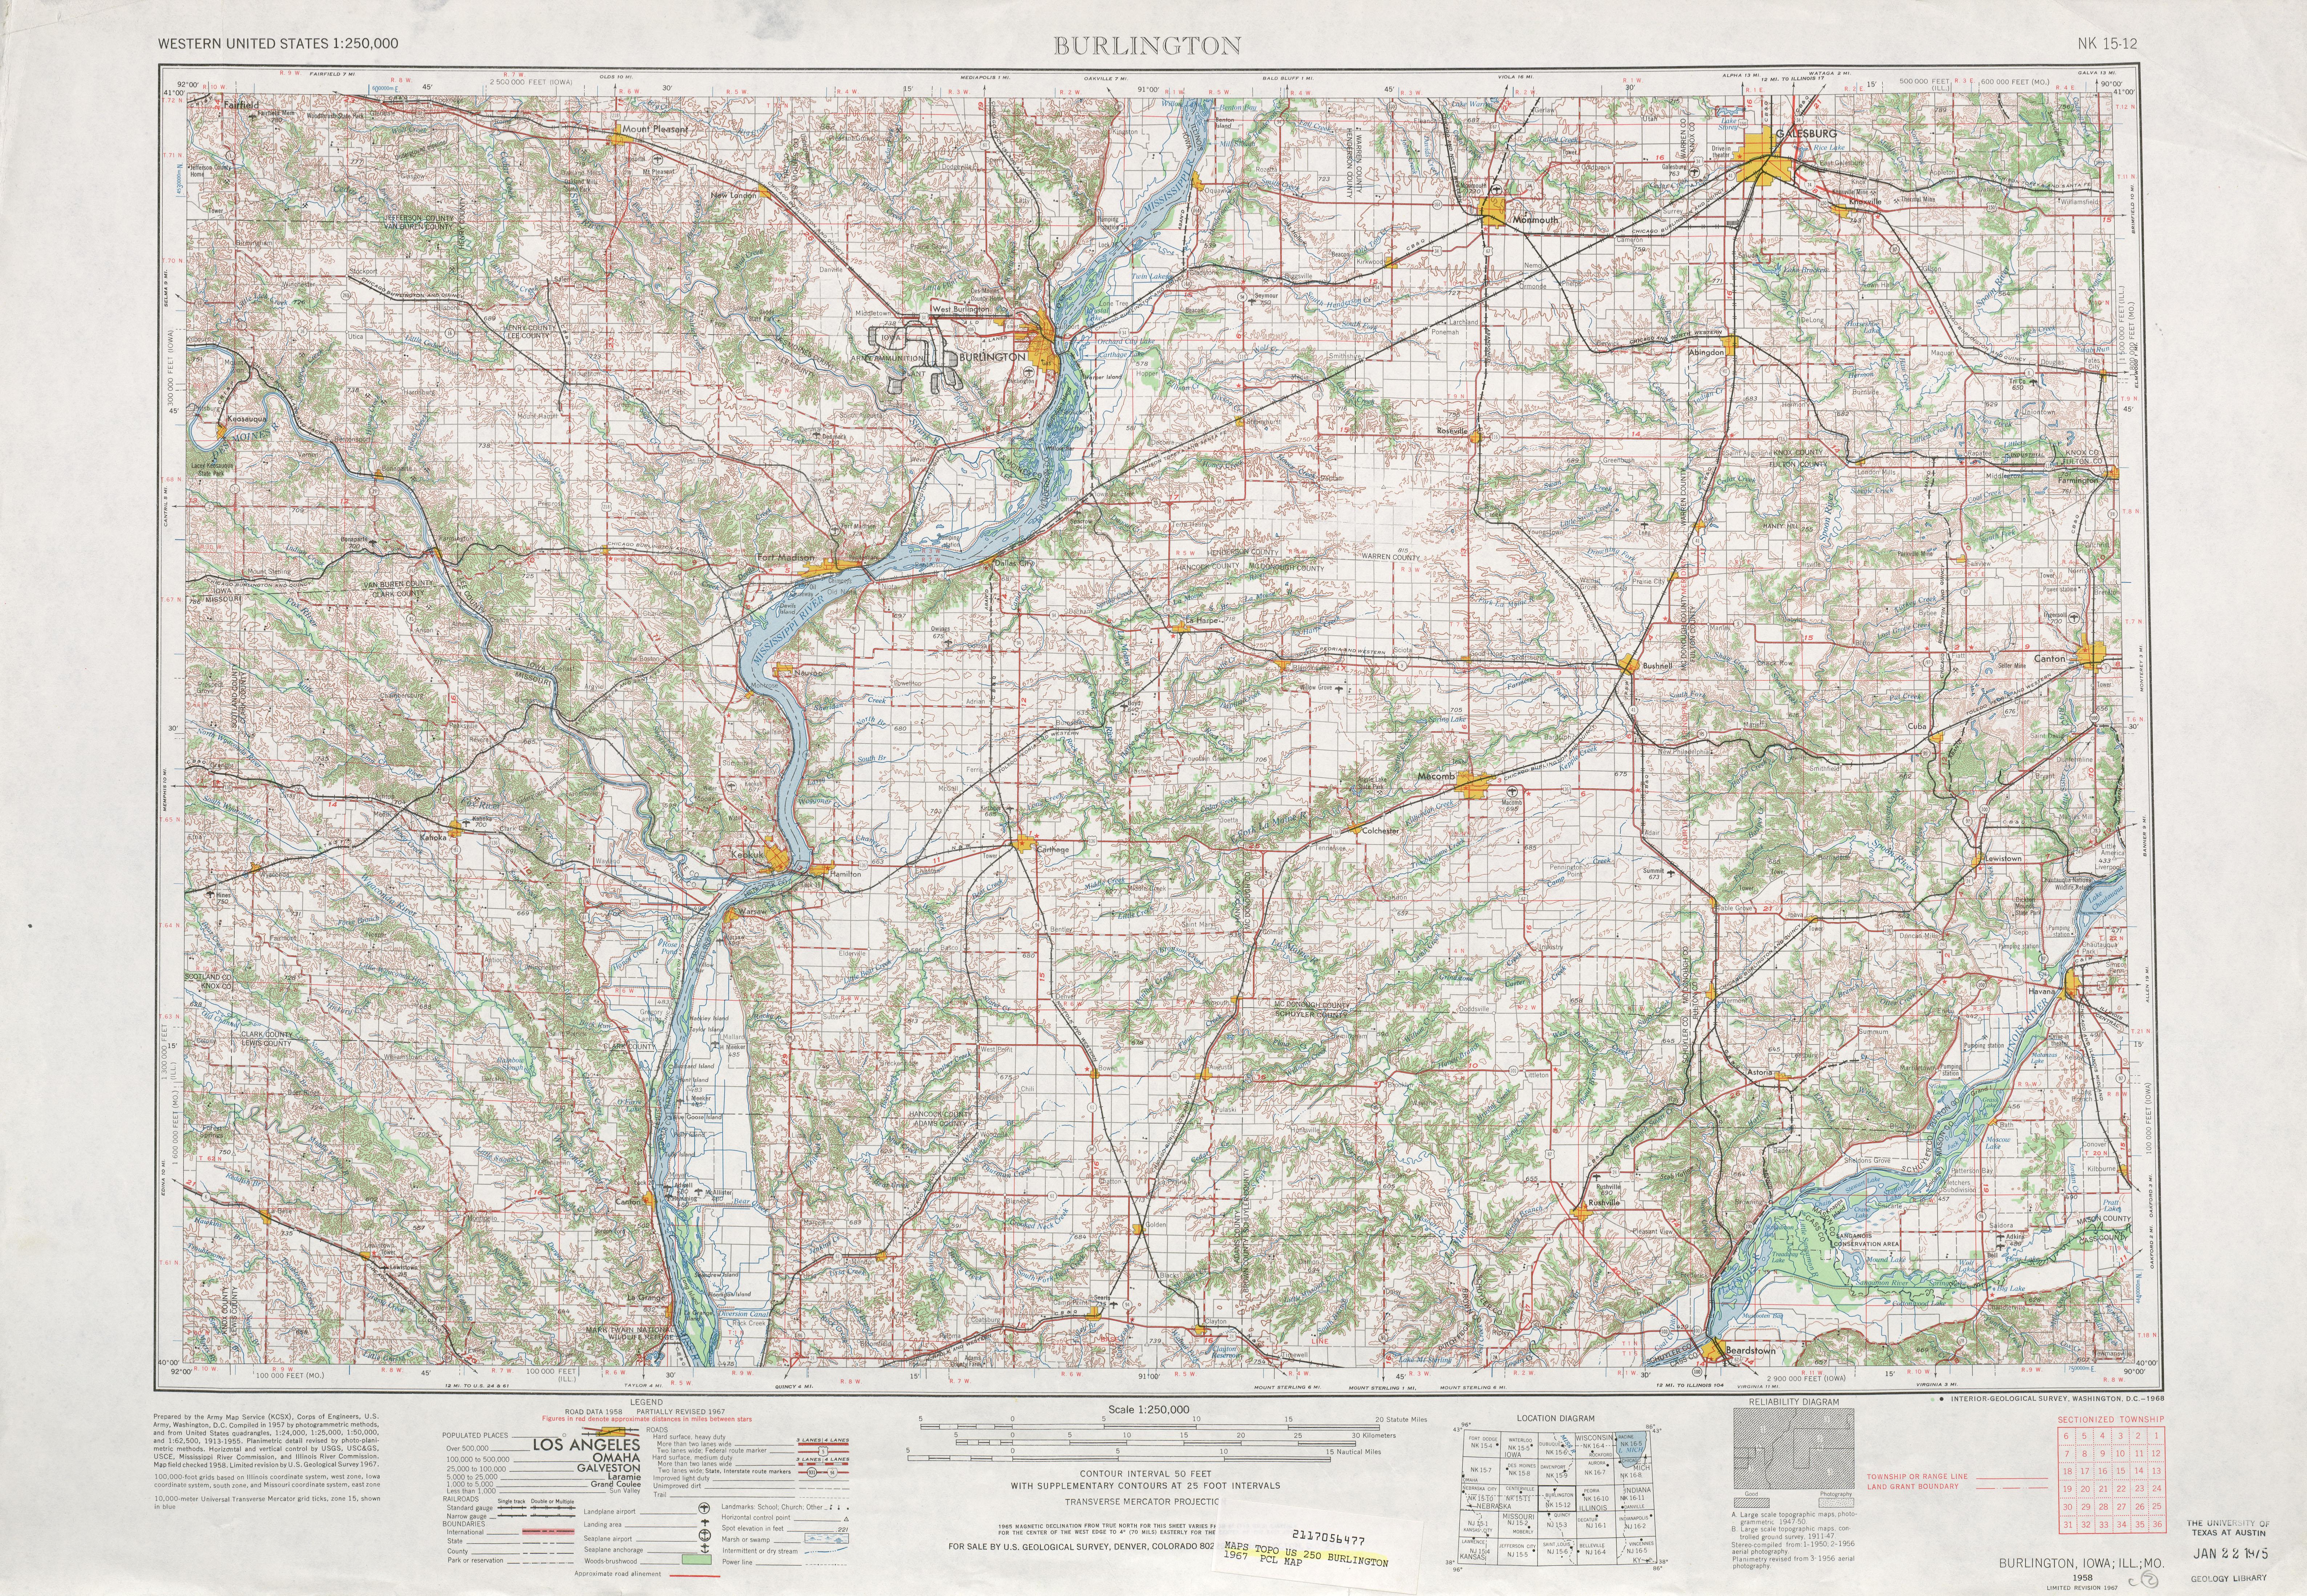 Burlington Topographic Map Sheet, United States 1967